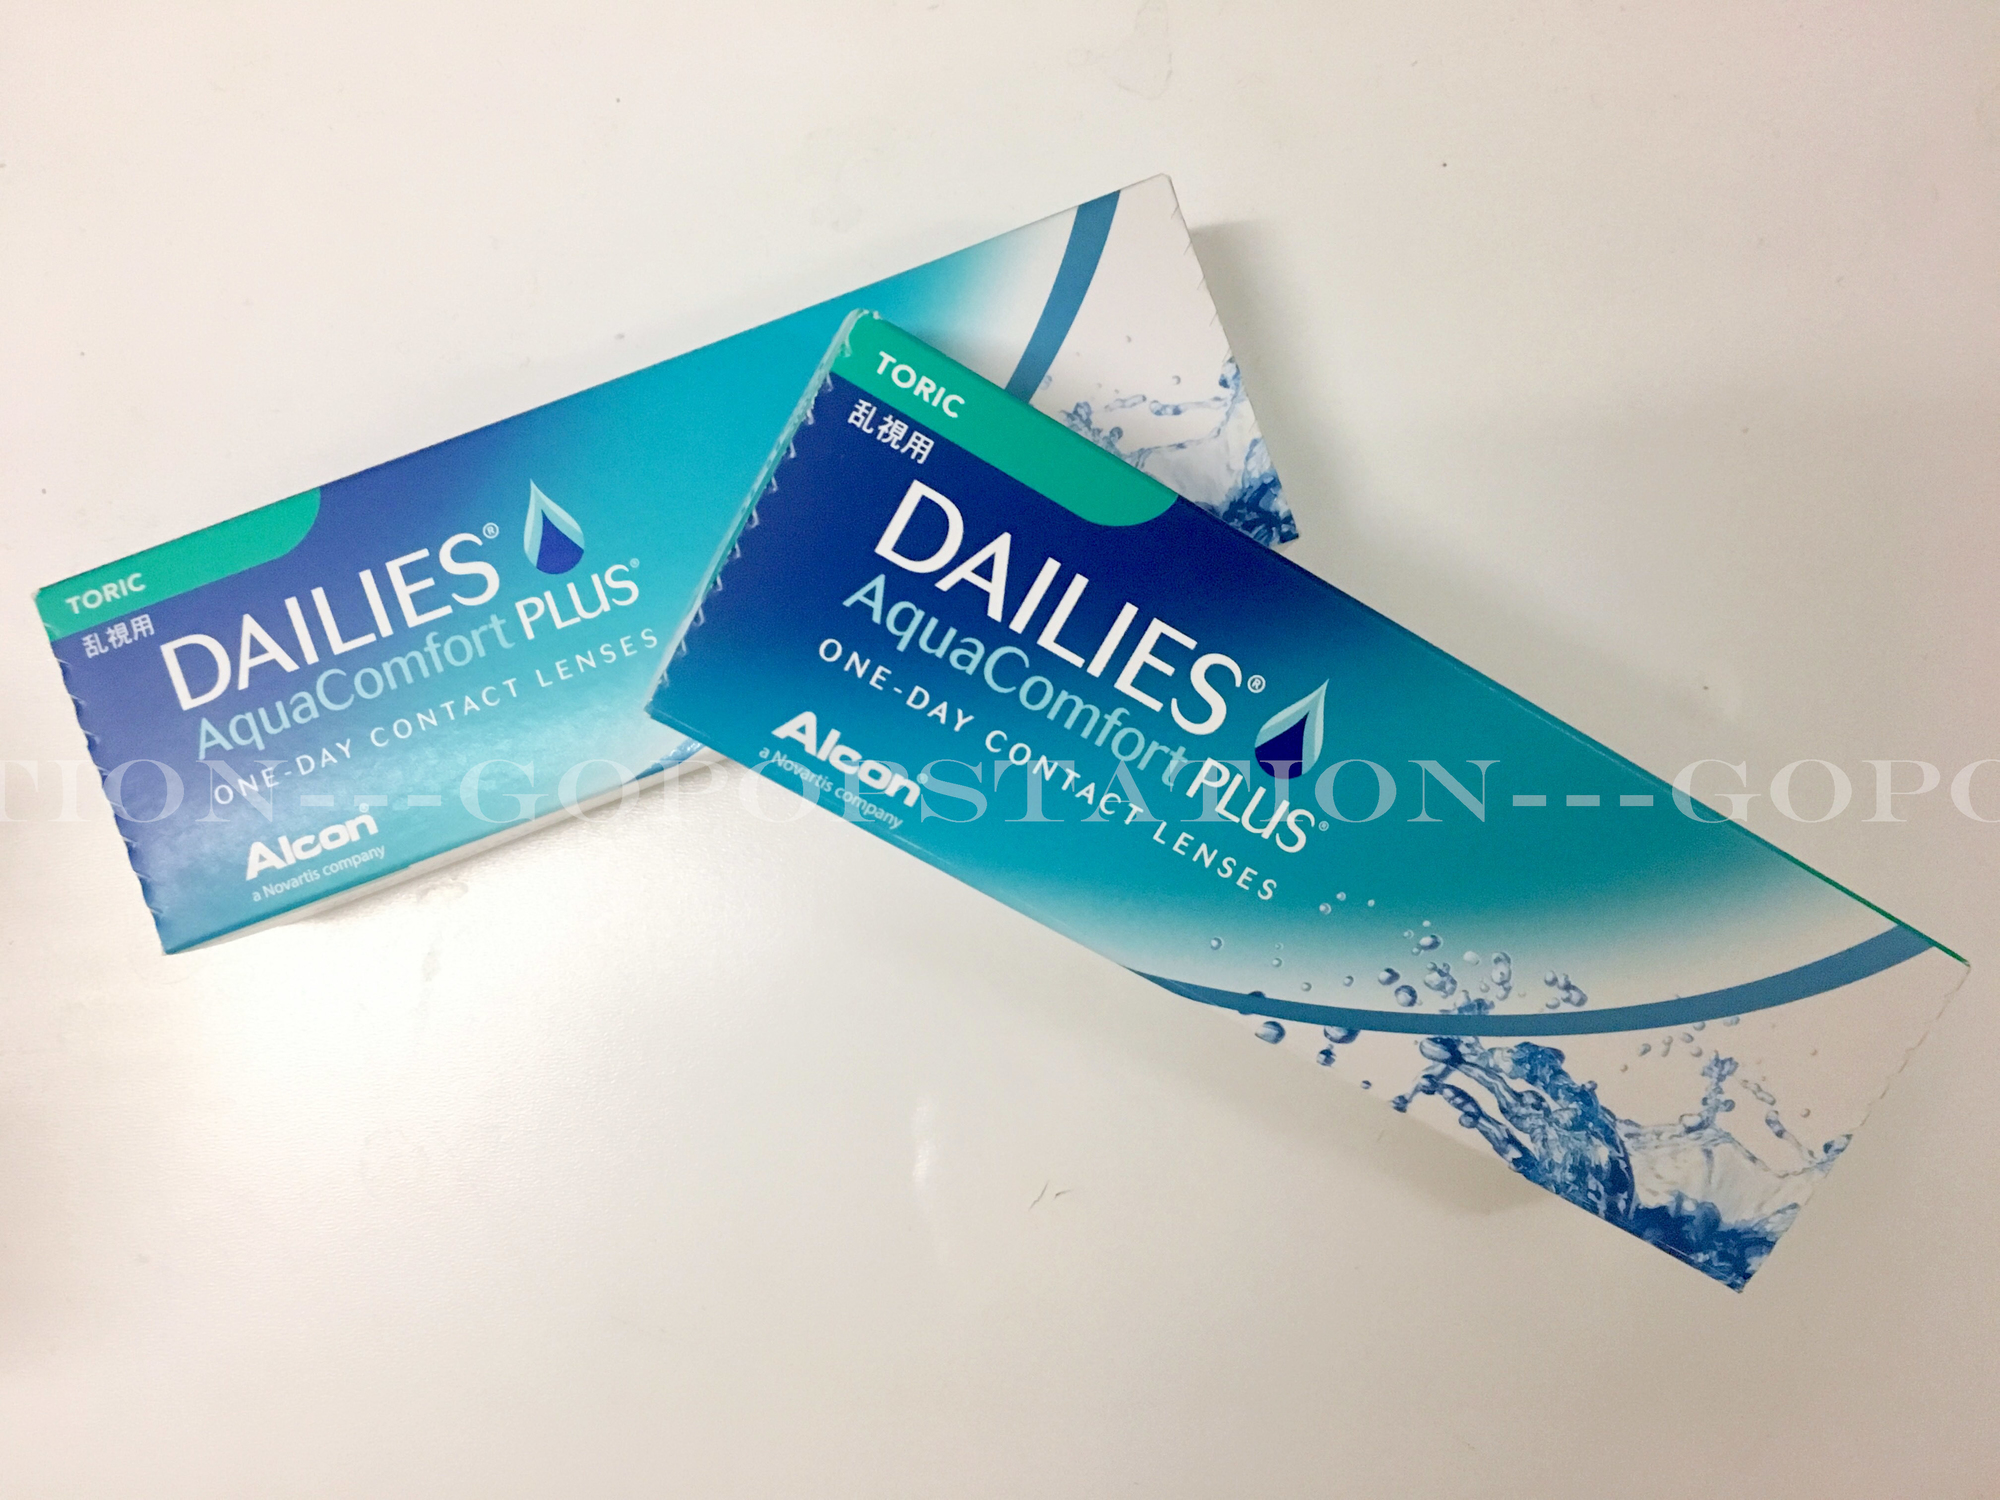 shop s optic dailies aquacomfort alcon comforter plus thaihuot comfort aqua